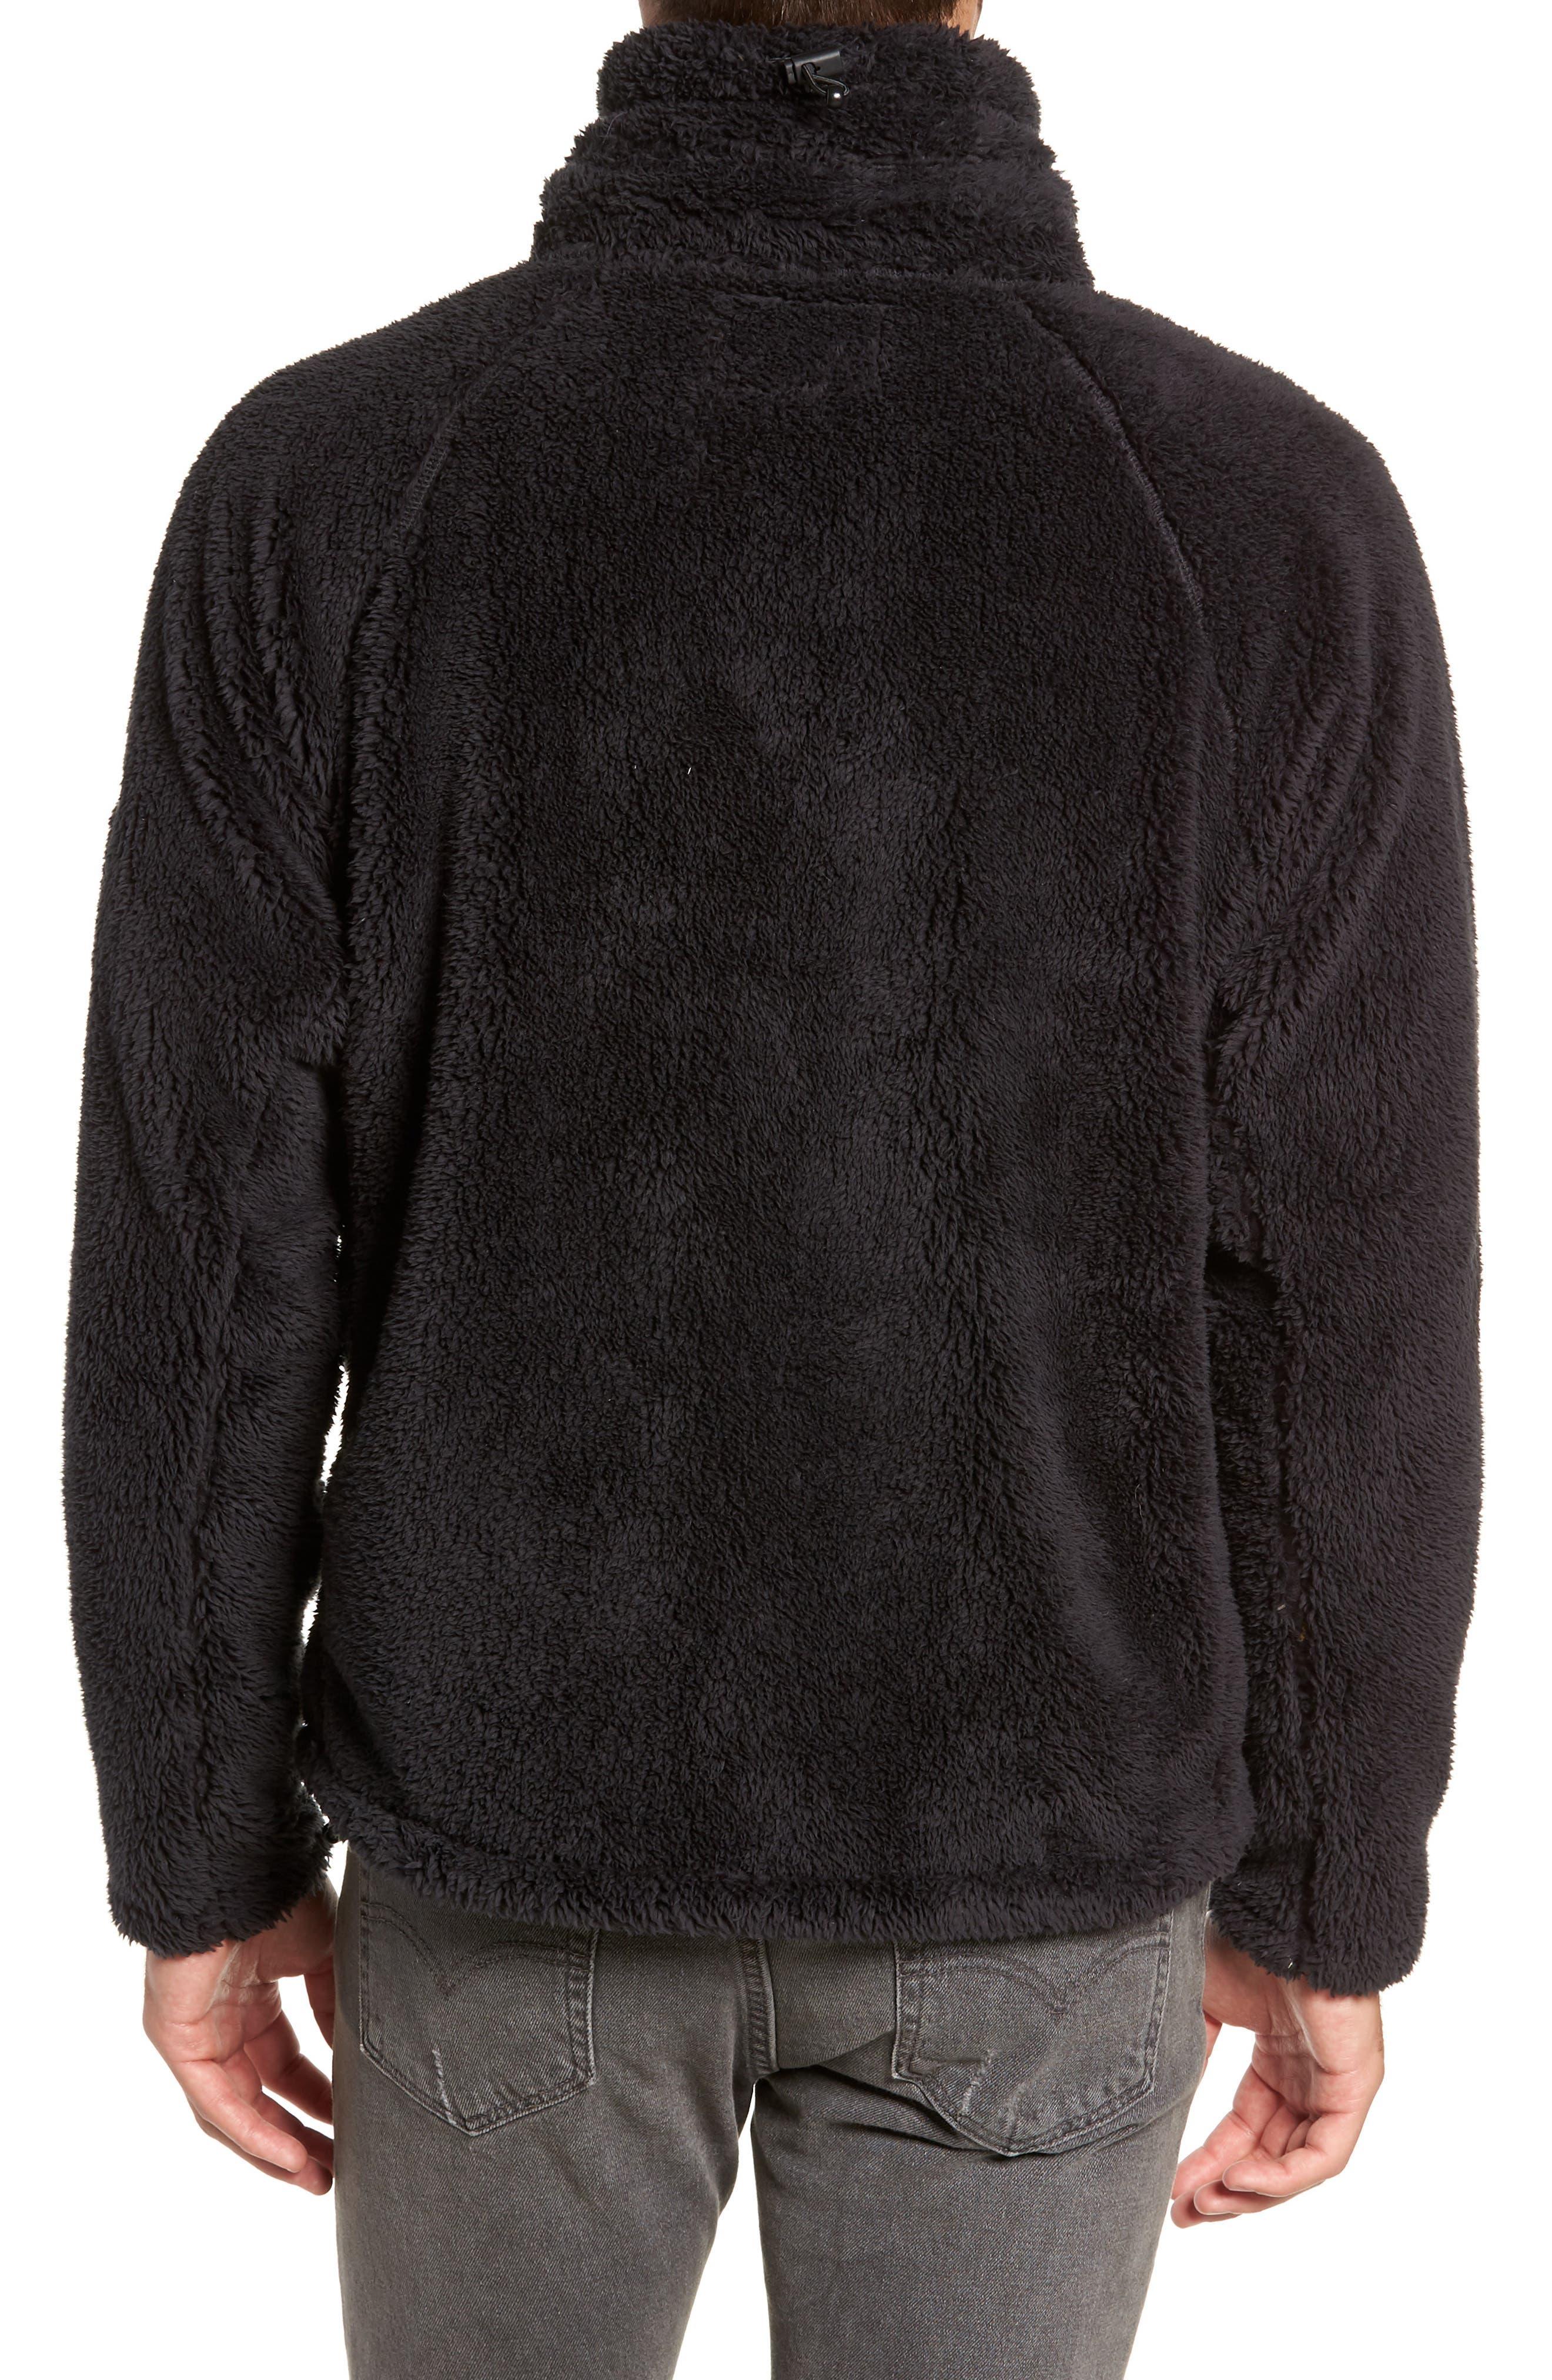 Breakheart Zip Fleece Jacket,                             Alternate thumbnail 2, color,                             001